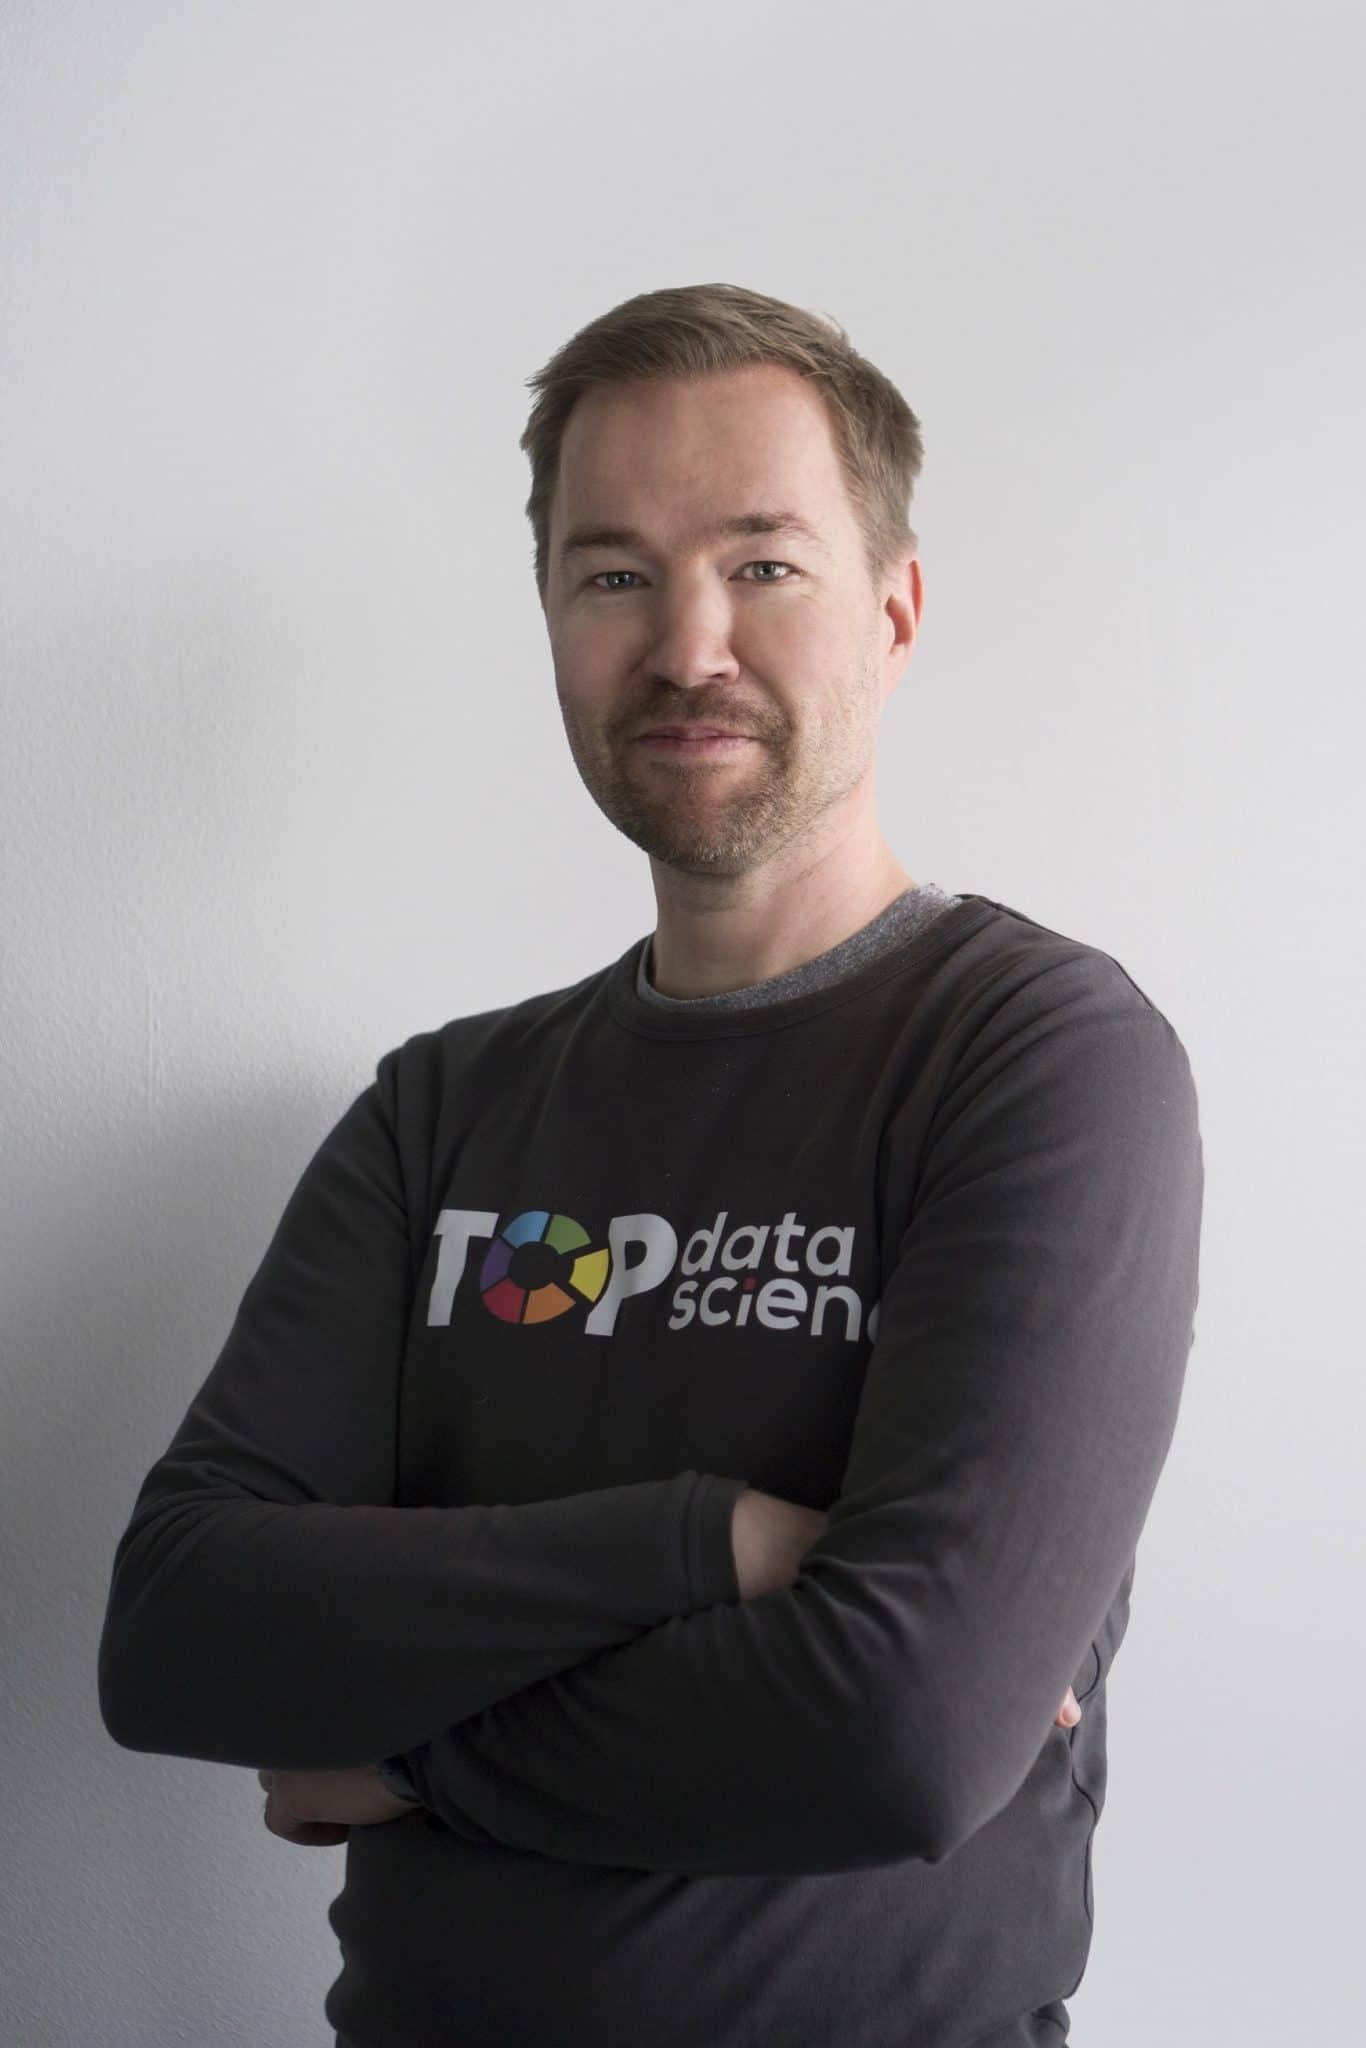 Timo Heikkinen Top Data Science